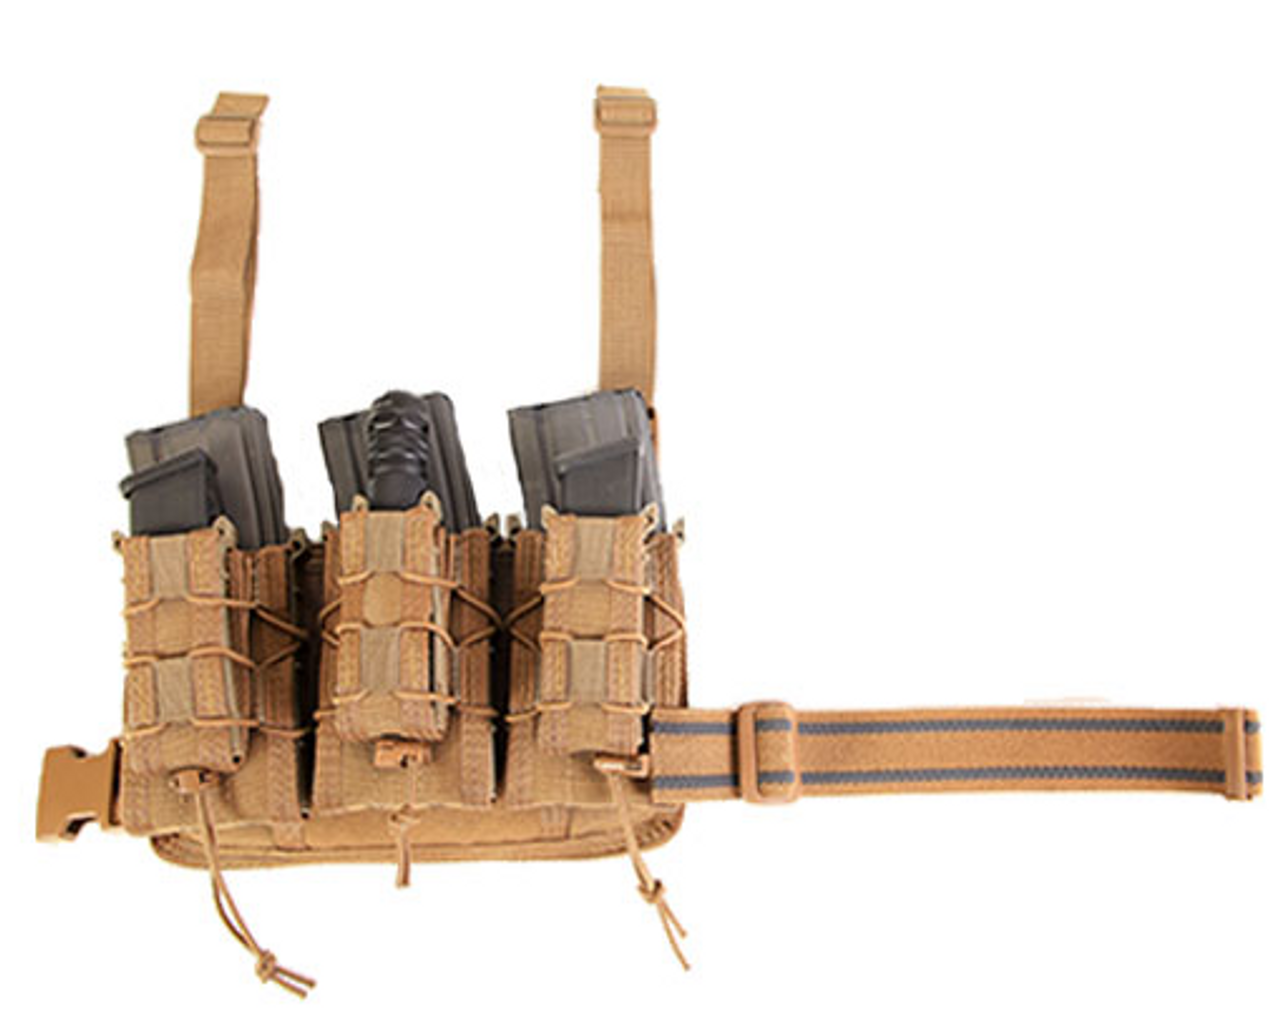 HSGI Double Decker Leg Rig - (Coyote Brown)